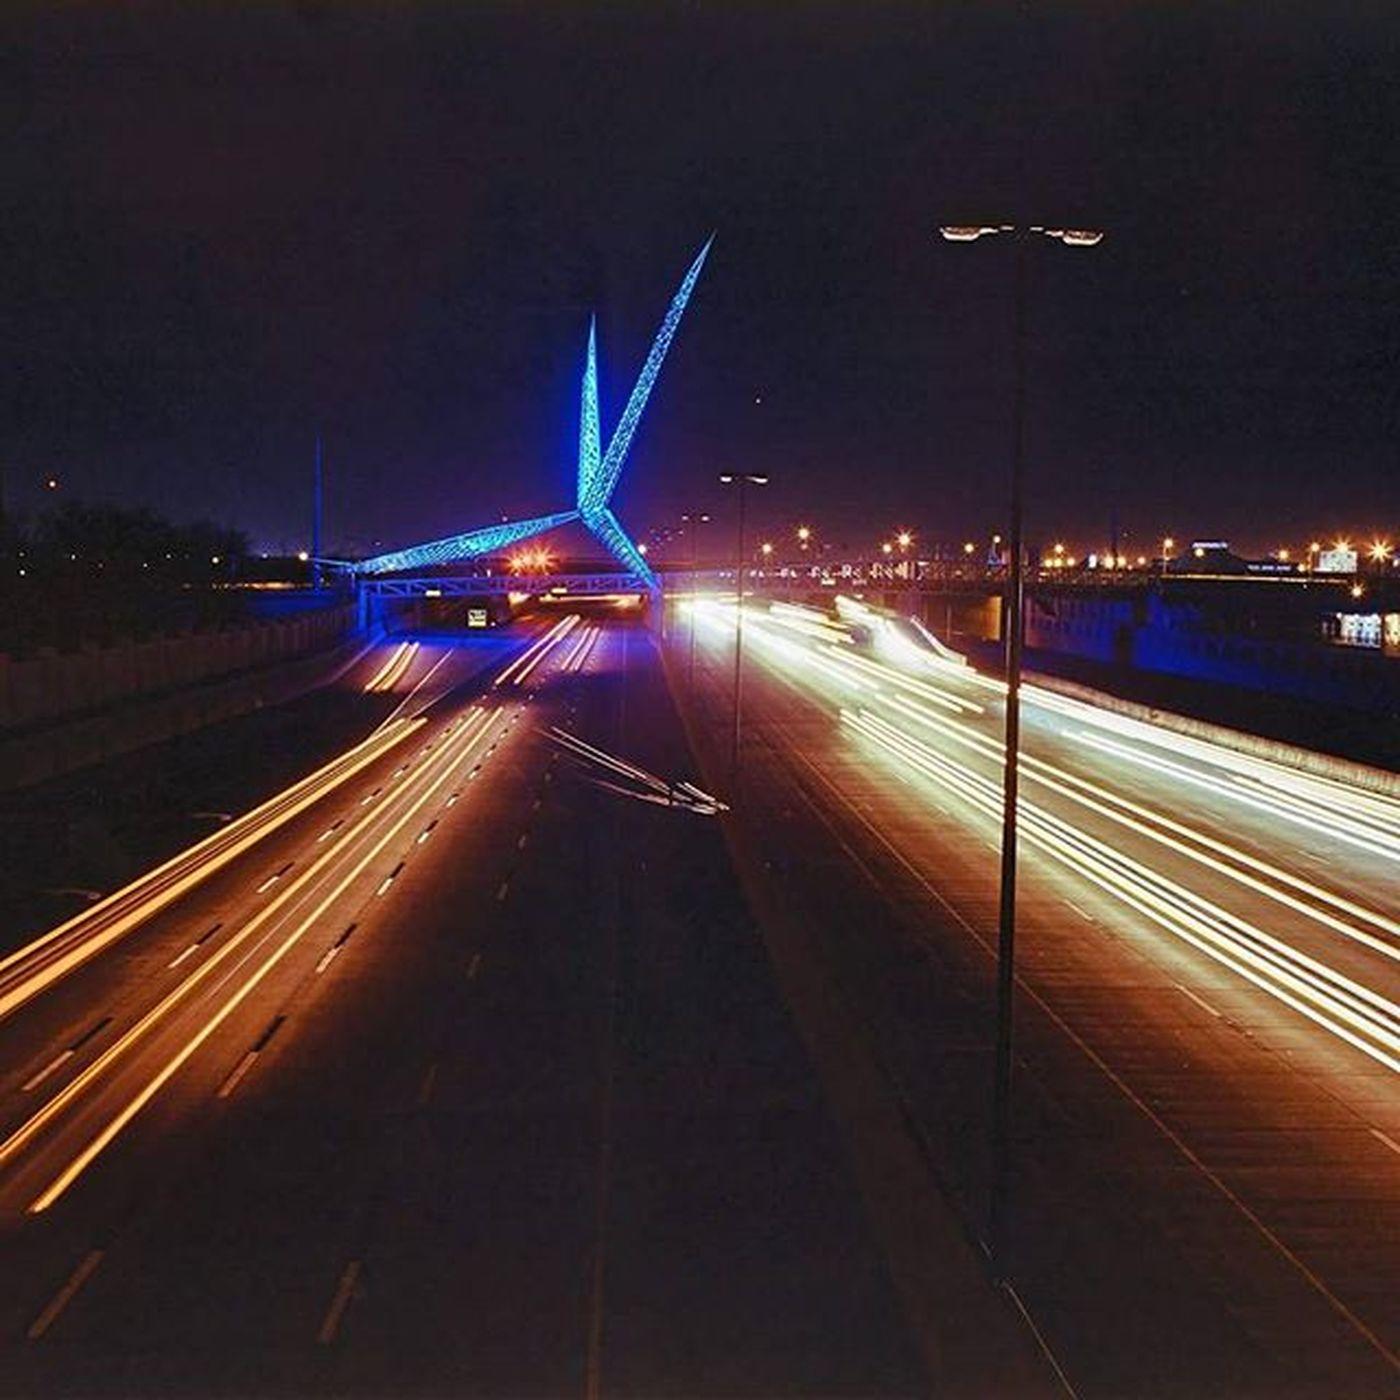 Skydance Oklahoma Oklahomacity Mamiya Rz67 Kodak Film Longexposure Night Lighttrails I40